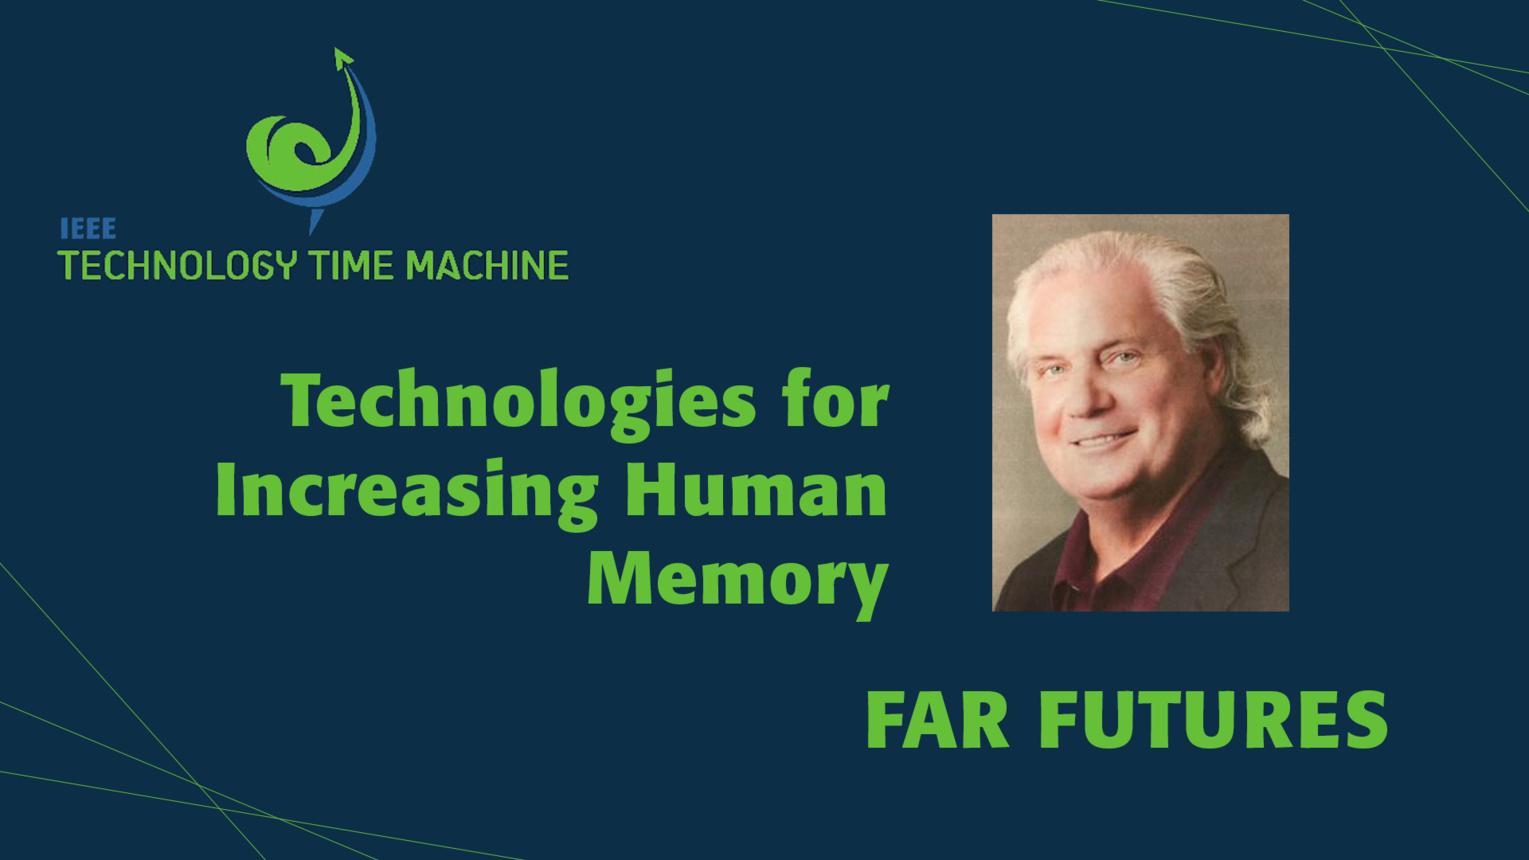 Ted Berger: Far Futures Panel - Technologies for Increasing Human Memory - TTM 2018